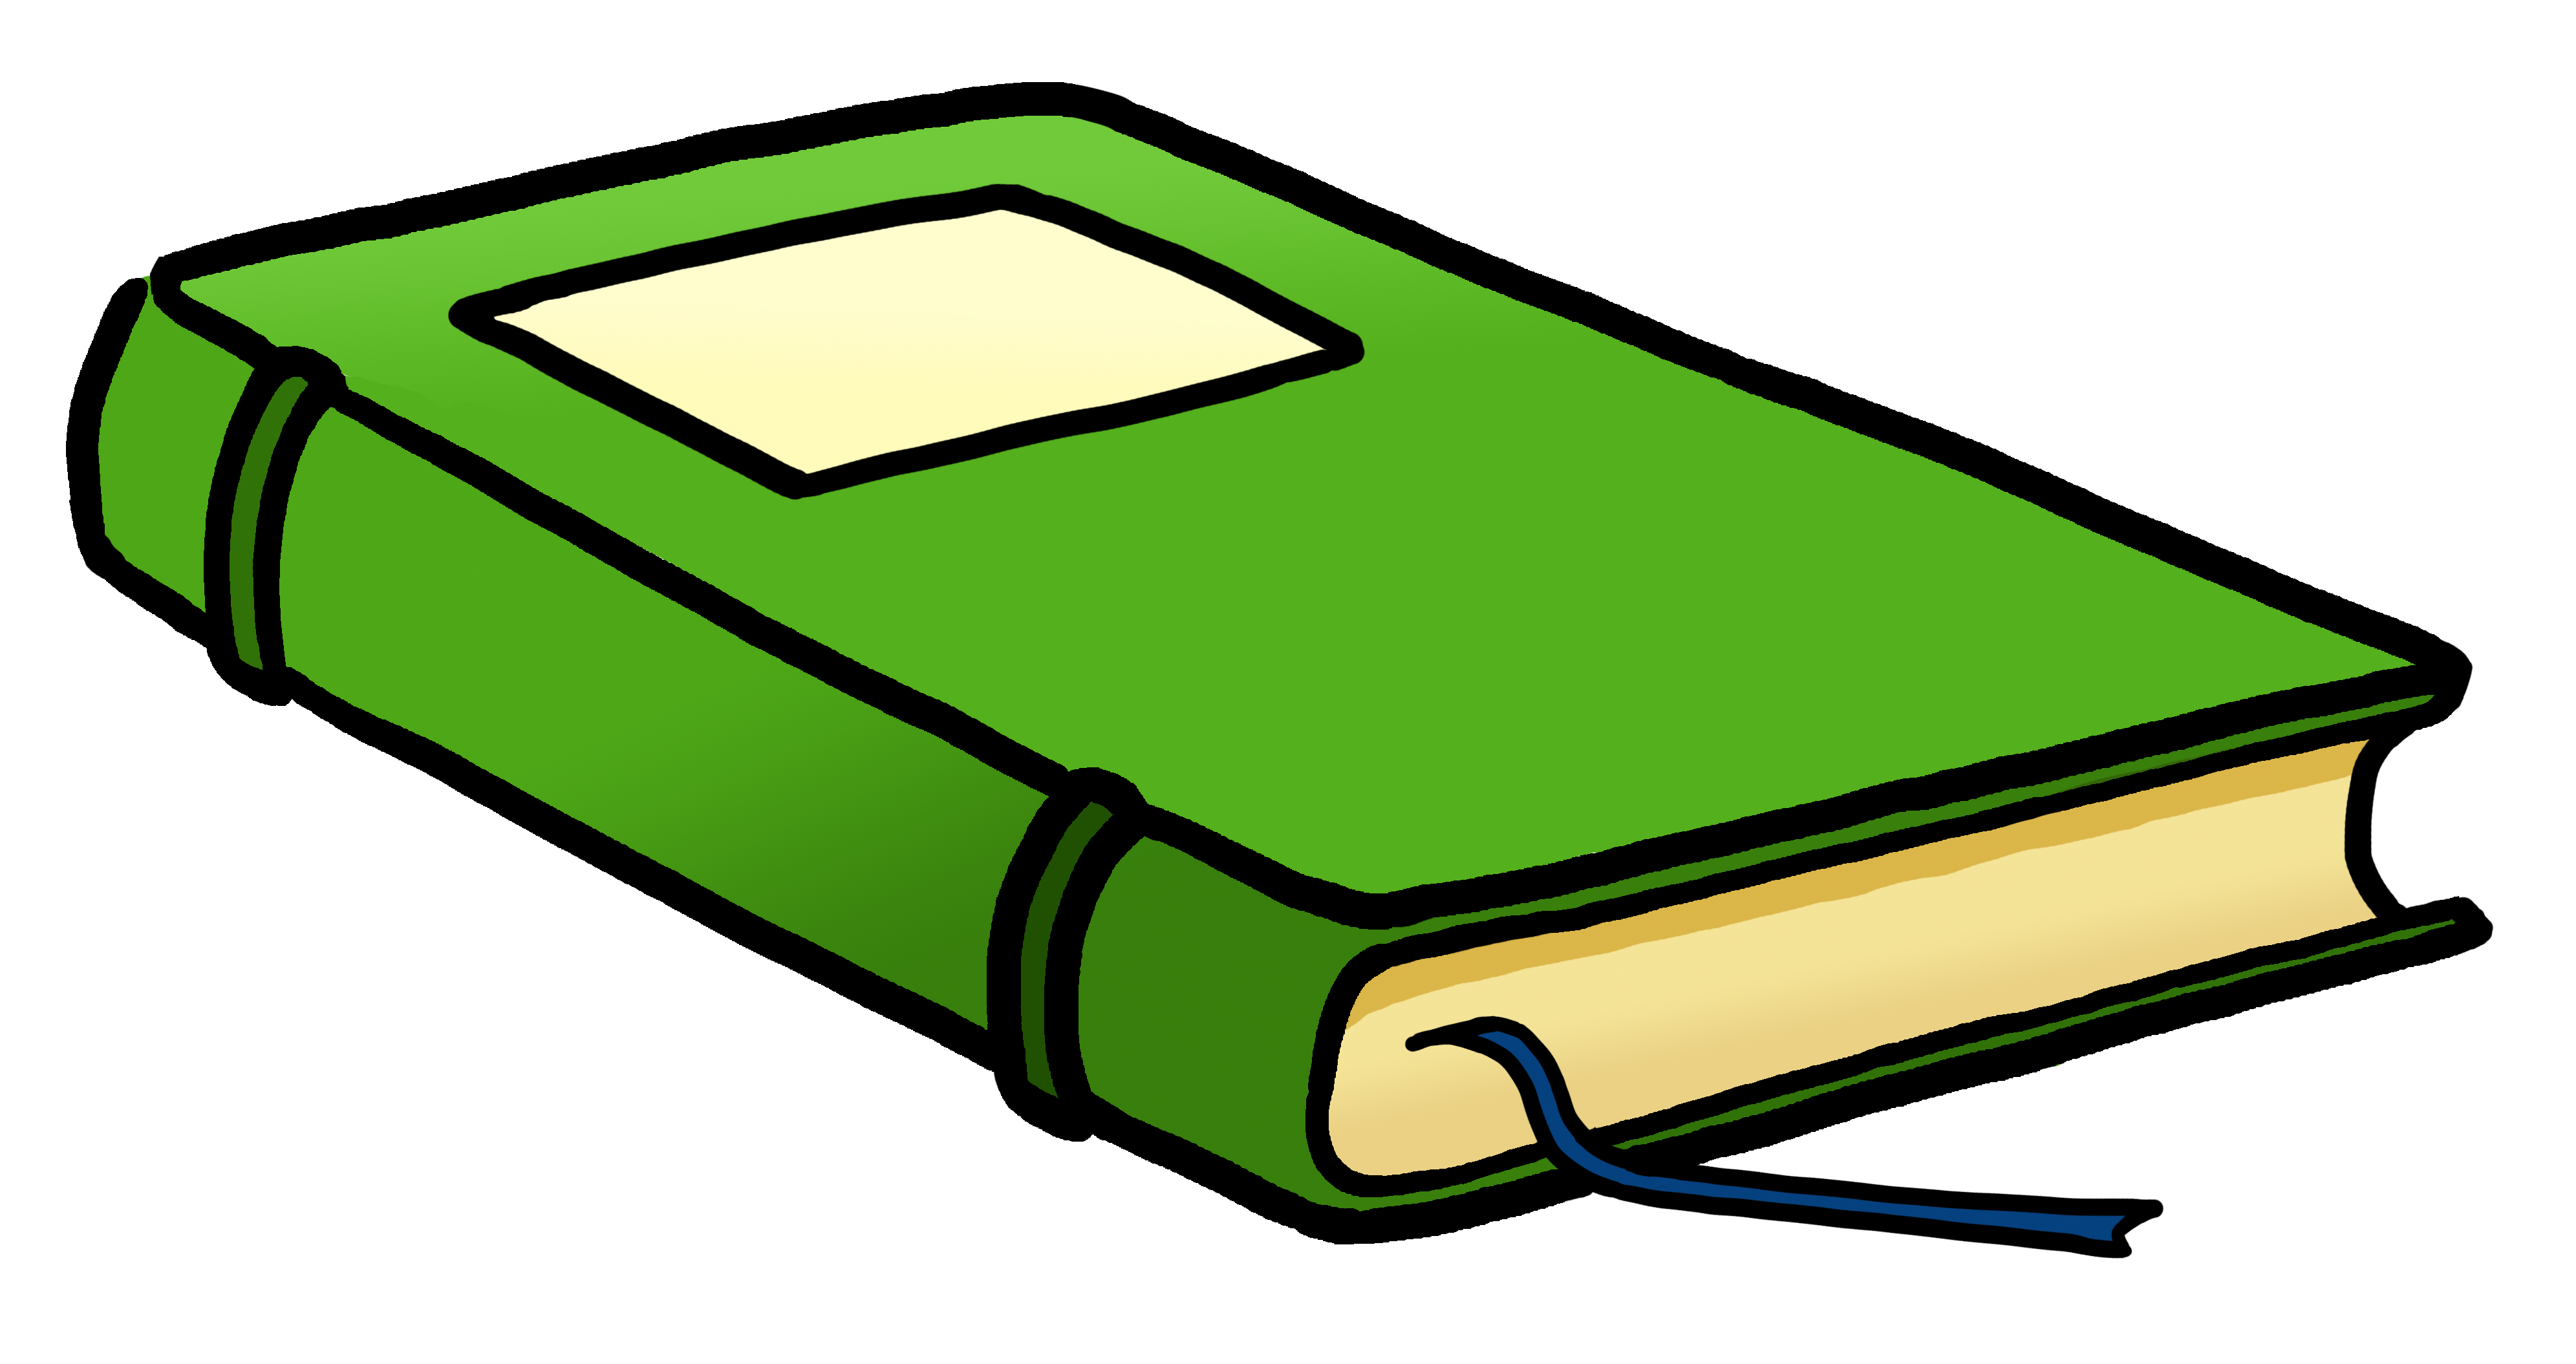 Clipart books children's book, Clipart books children's book.